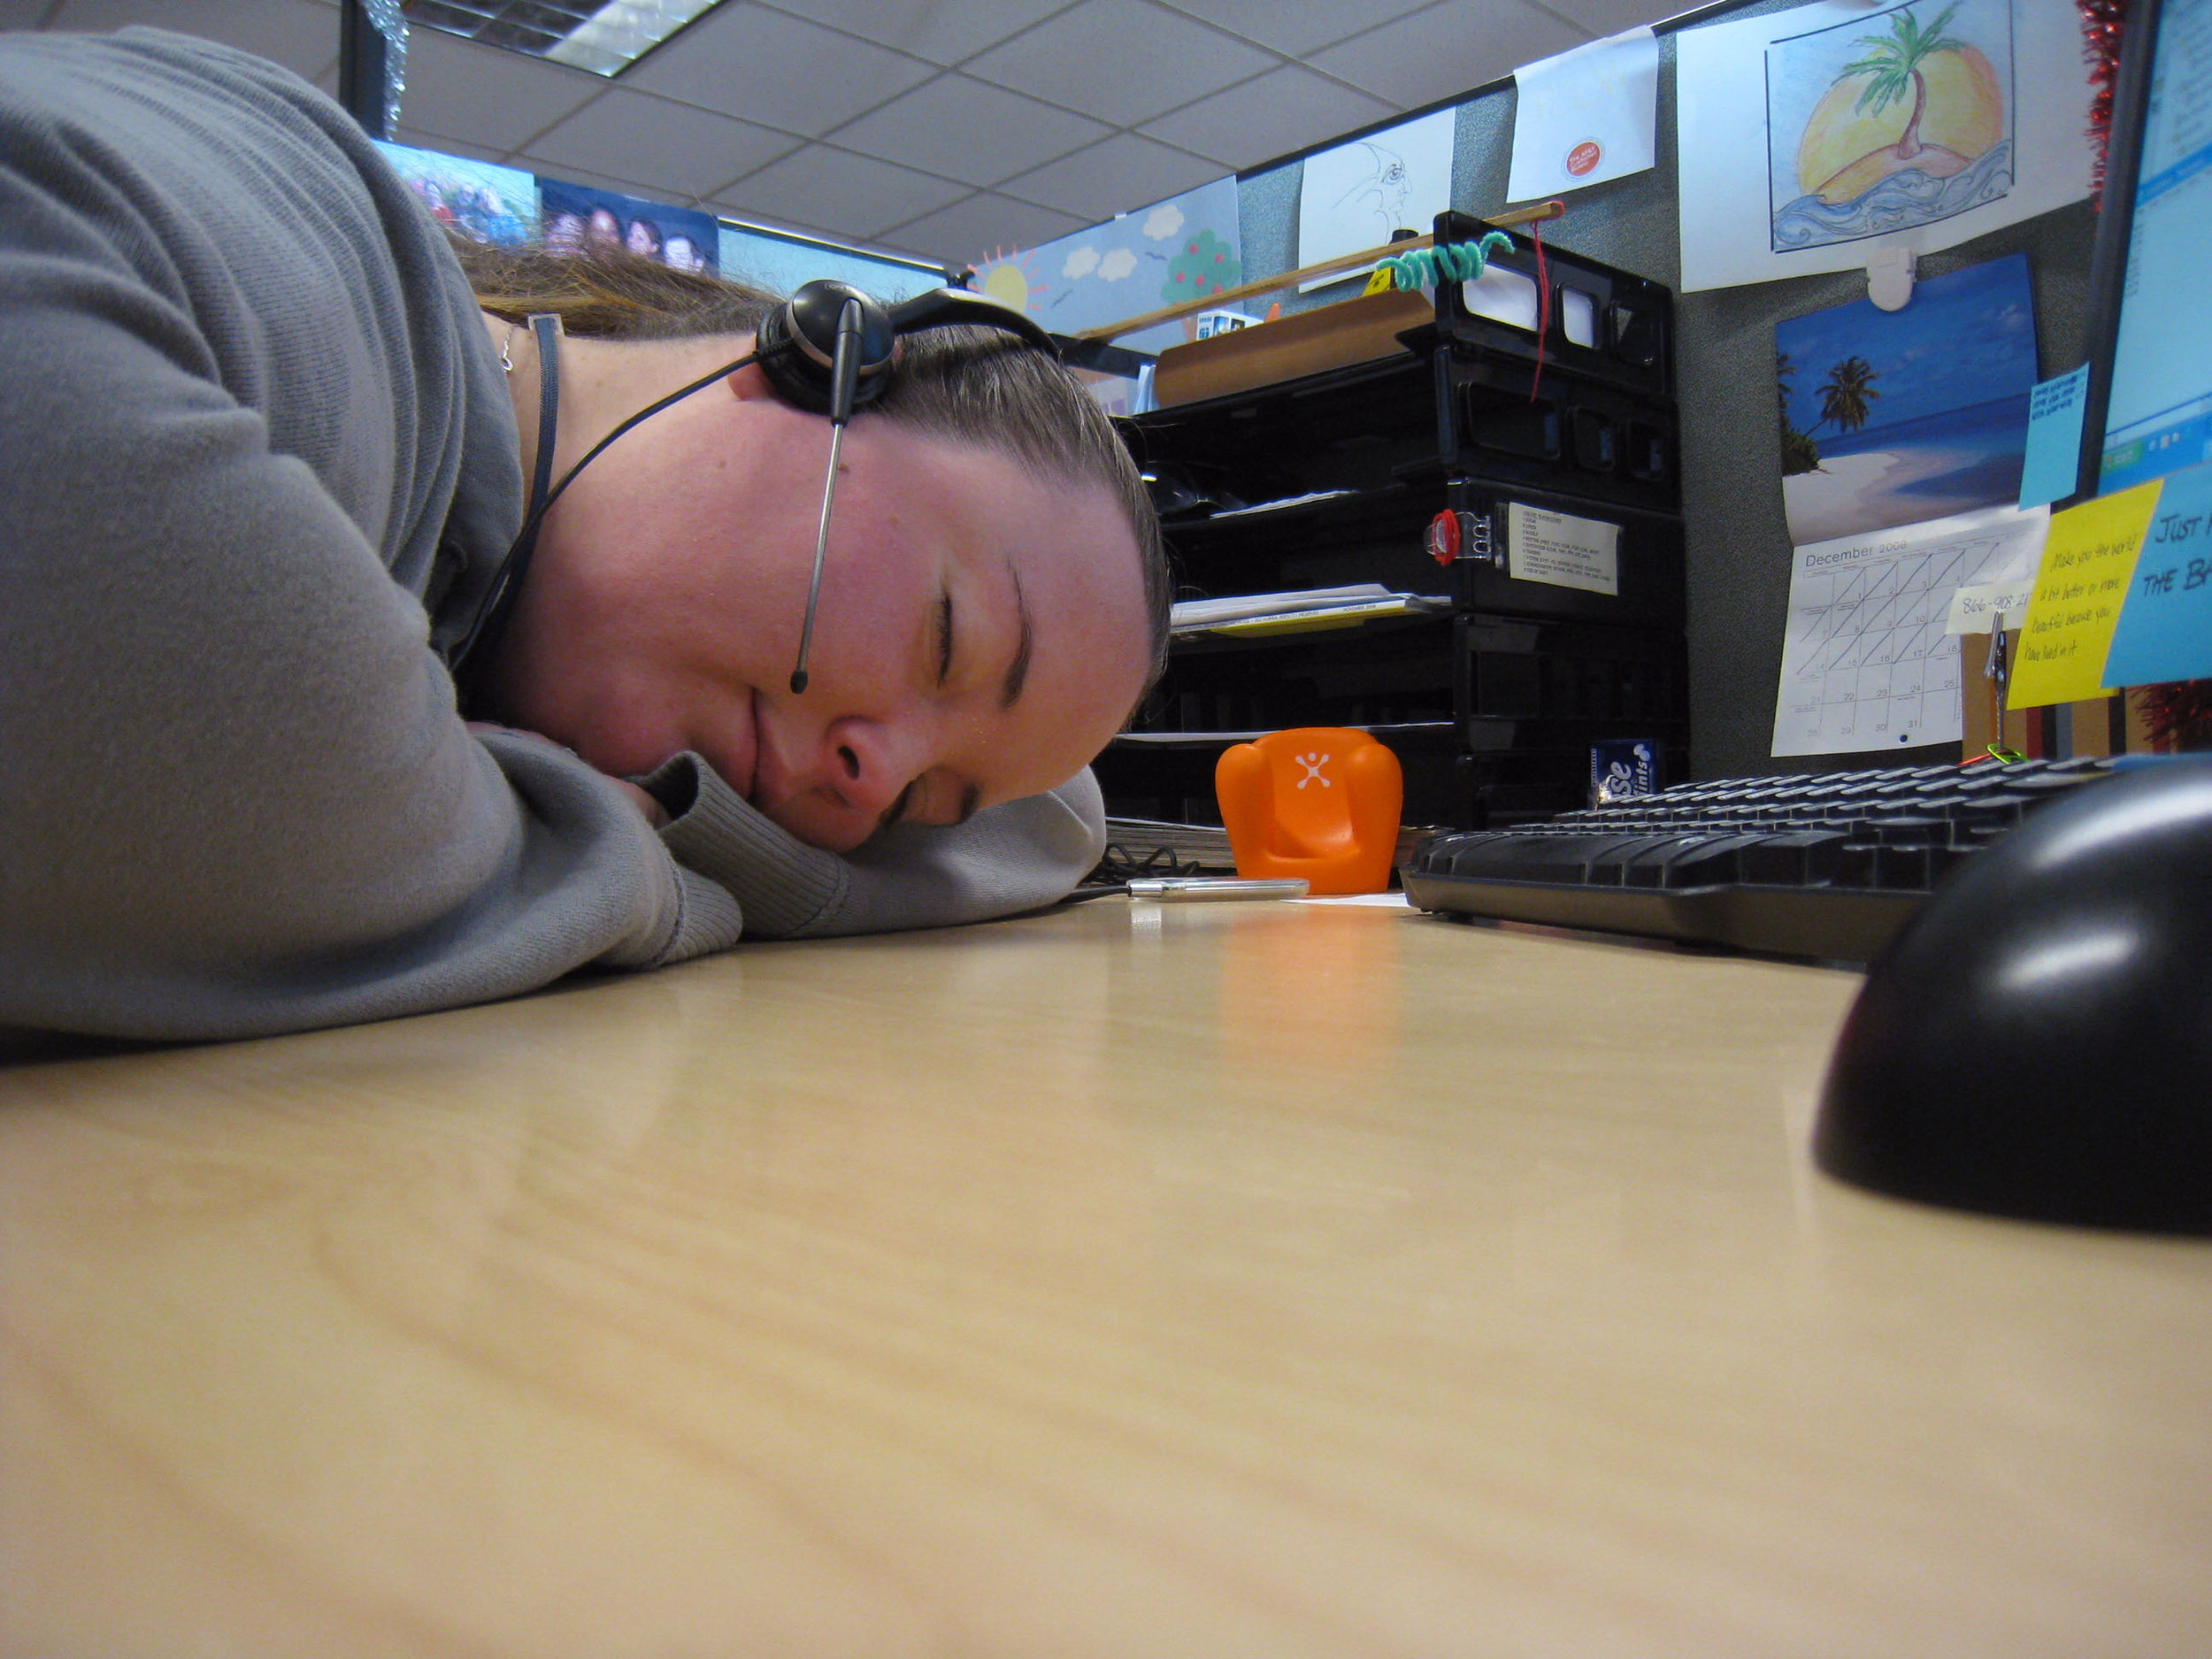 Maybe sleeping on the job is a good idea?